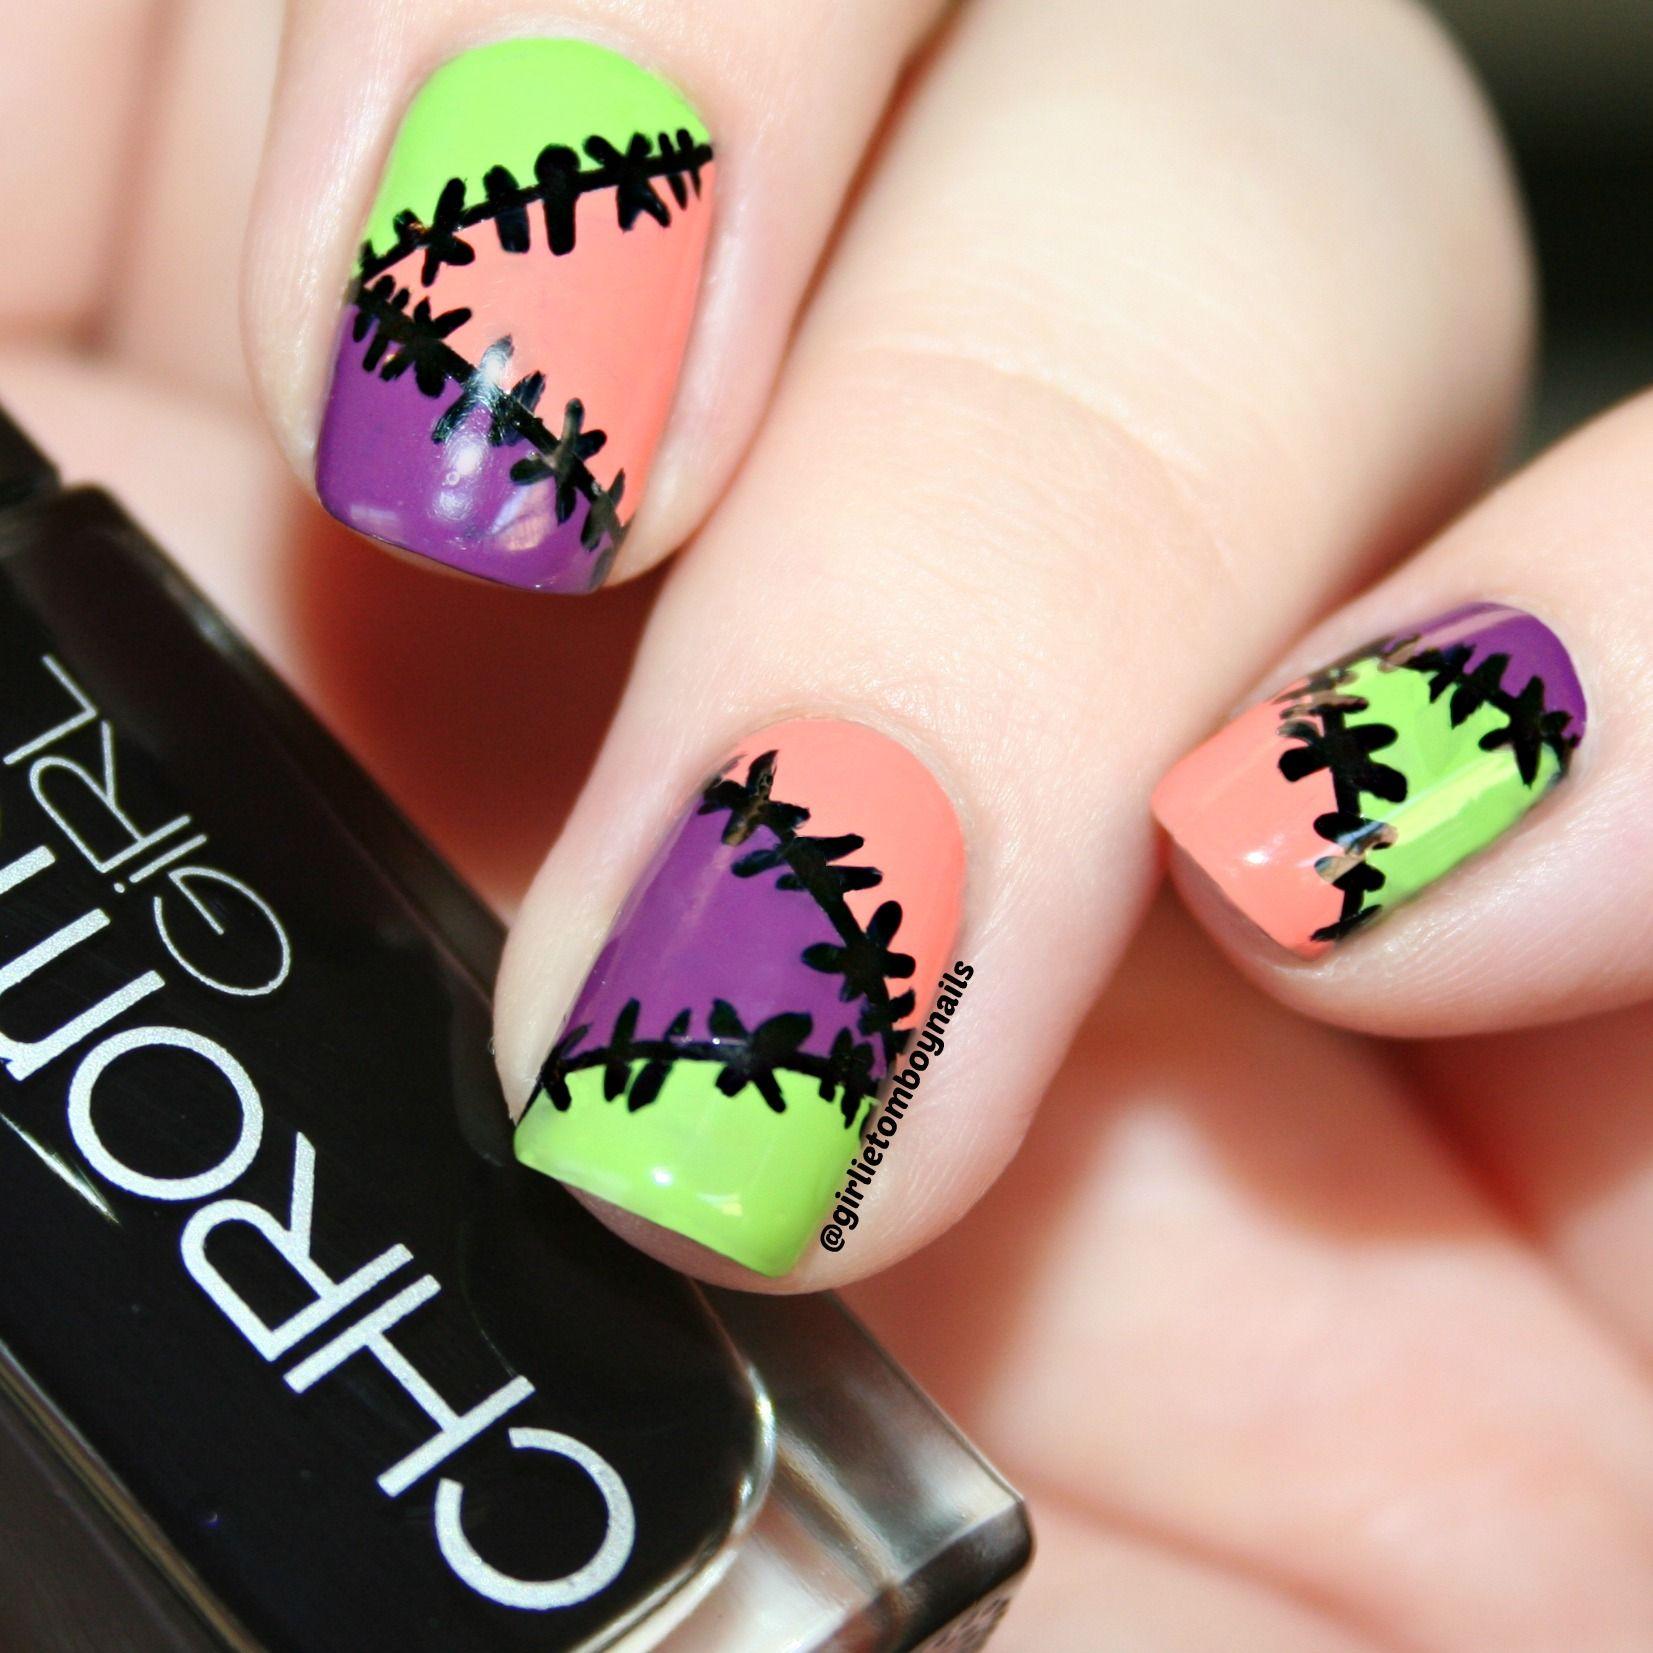 Frankenstitch Stitched Halloween Nail Art using Chrome ...